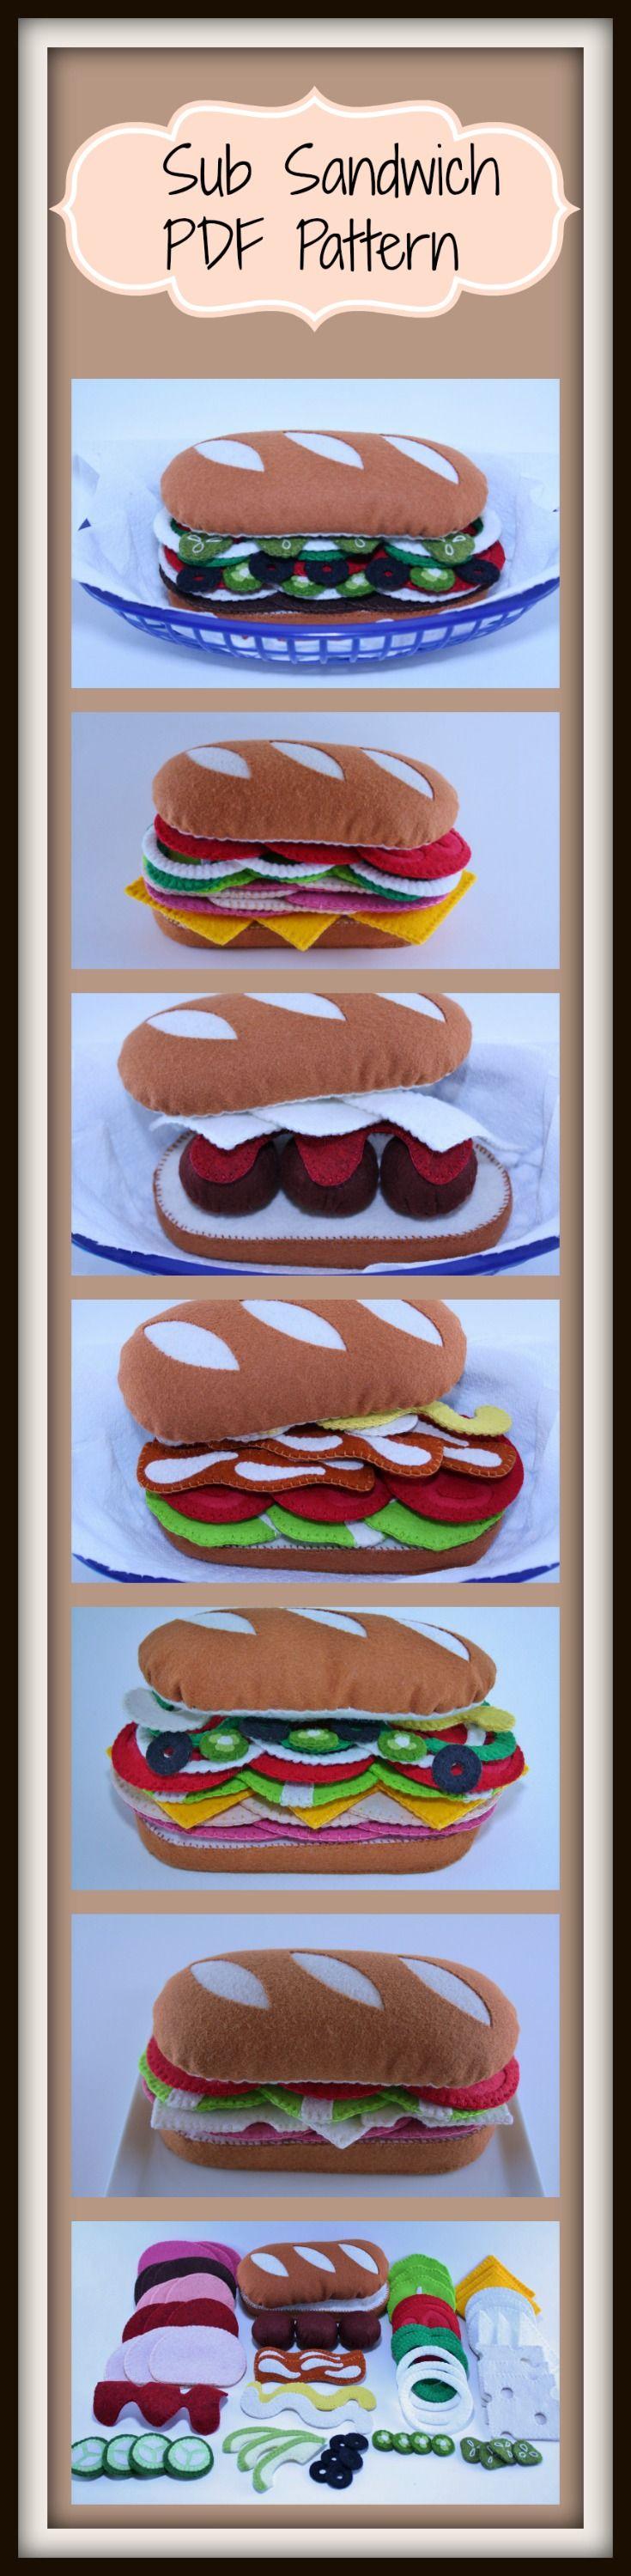 Sub Sandwich instant download PDF pattern available at www.etsy.com/shop/patternplanetshop